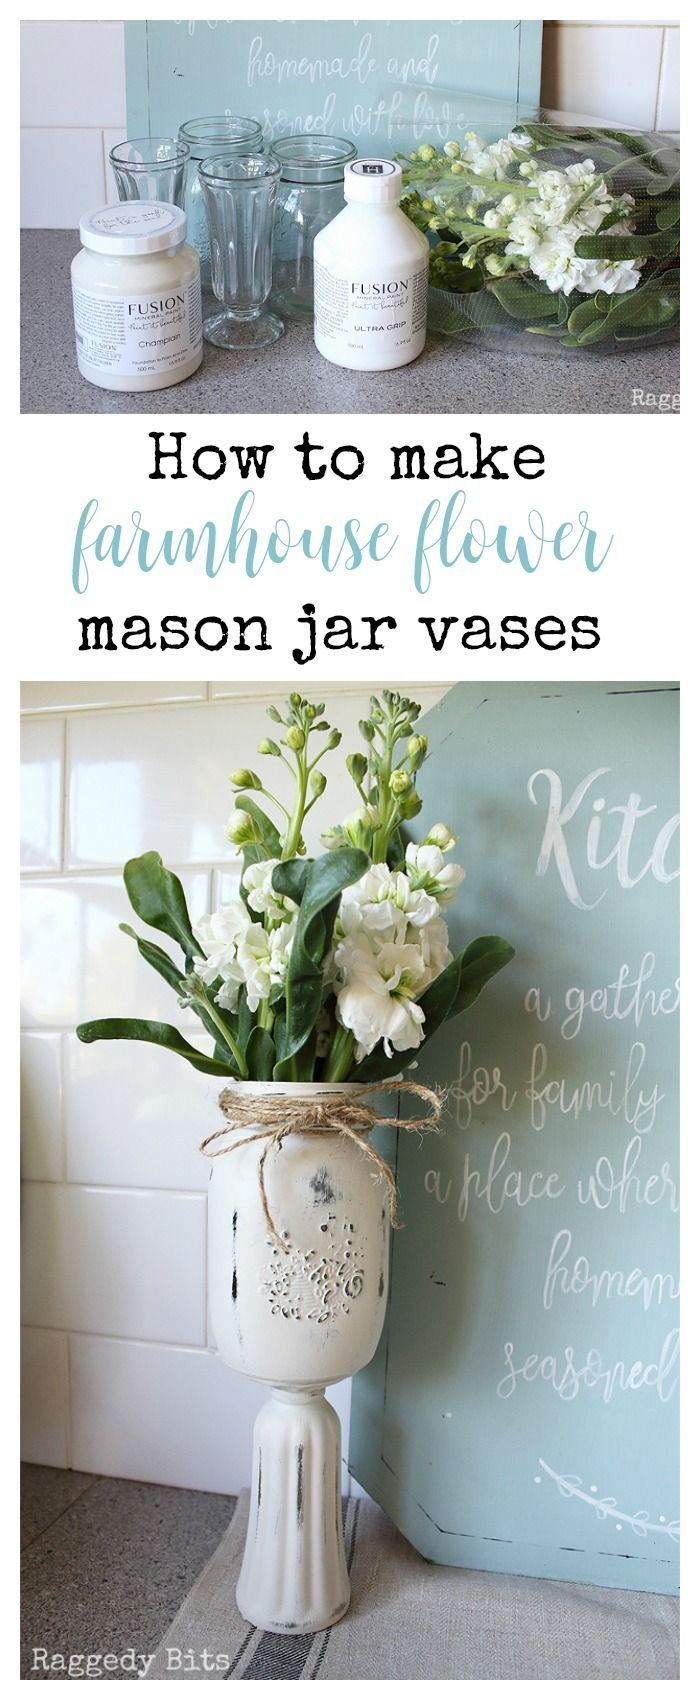 How to make farmhouse flower mason jar vases home pinterest